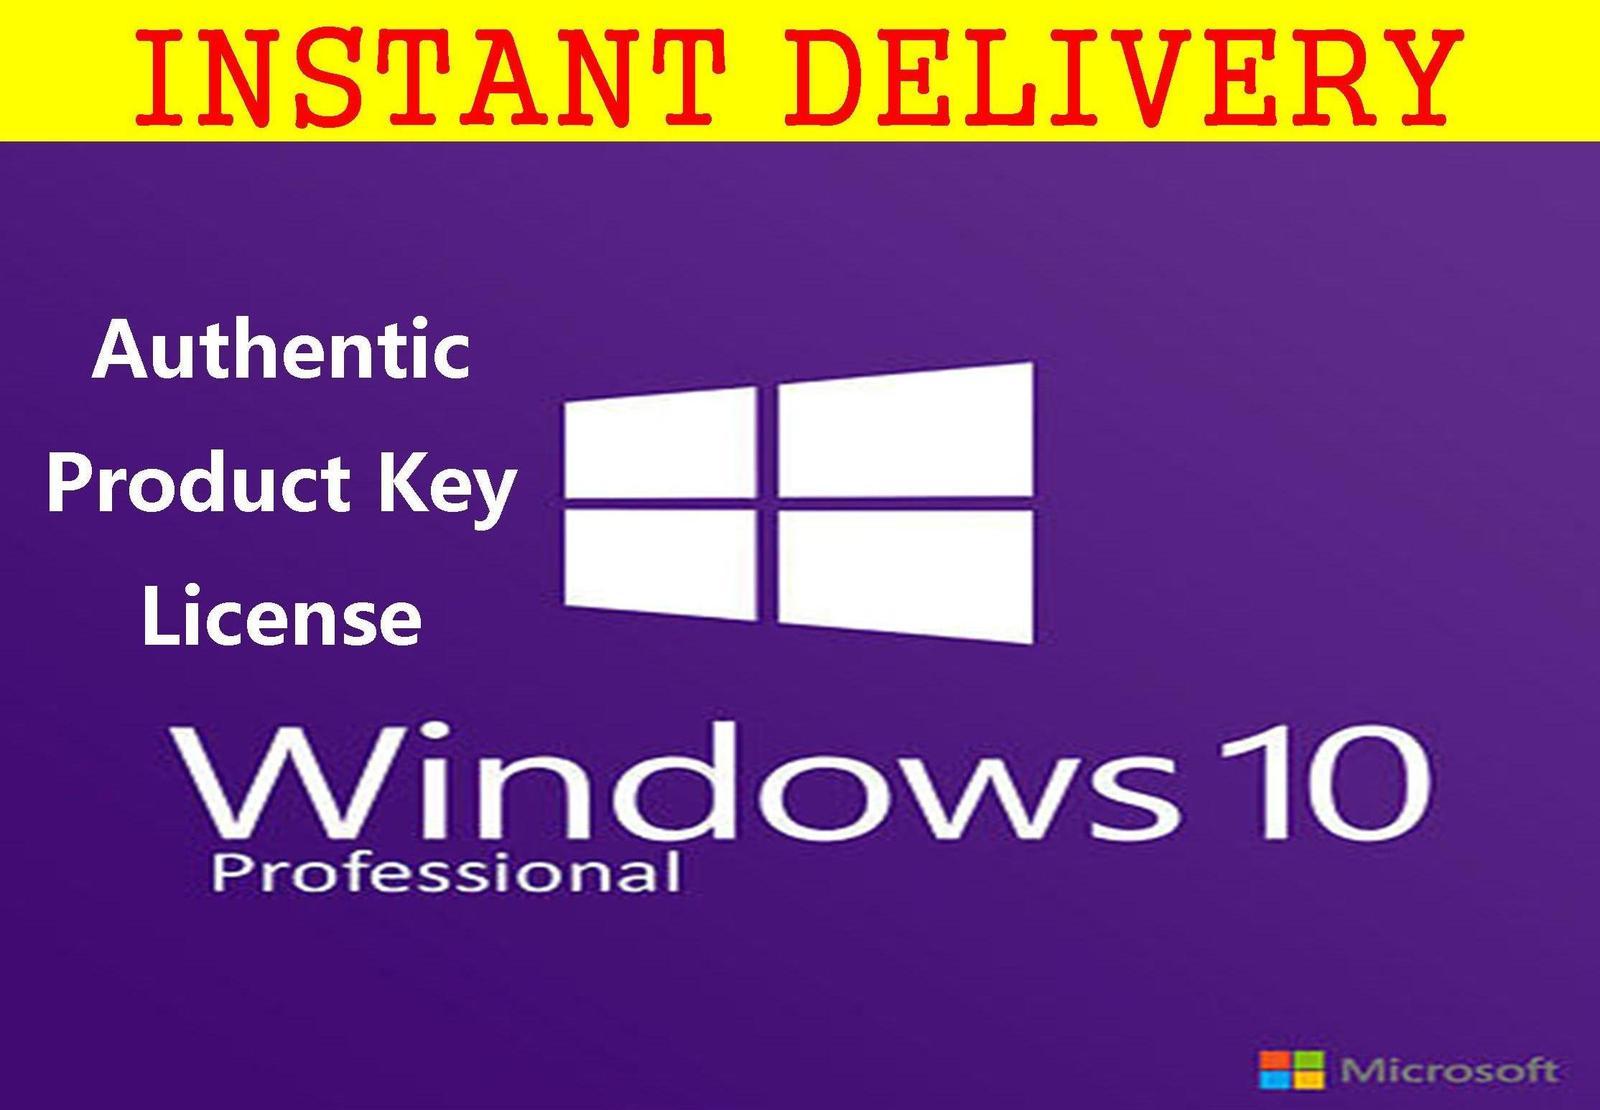 Windows 10 Pro 32/64 Authentic Product Key and 50 similar items